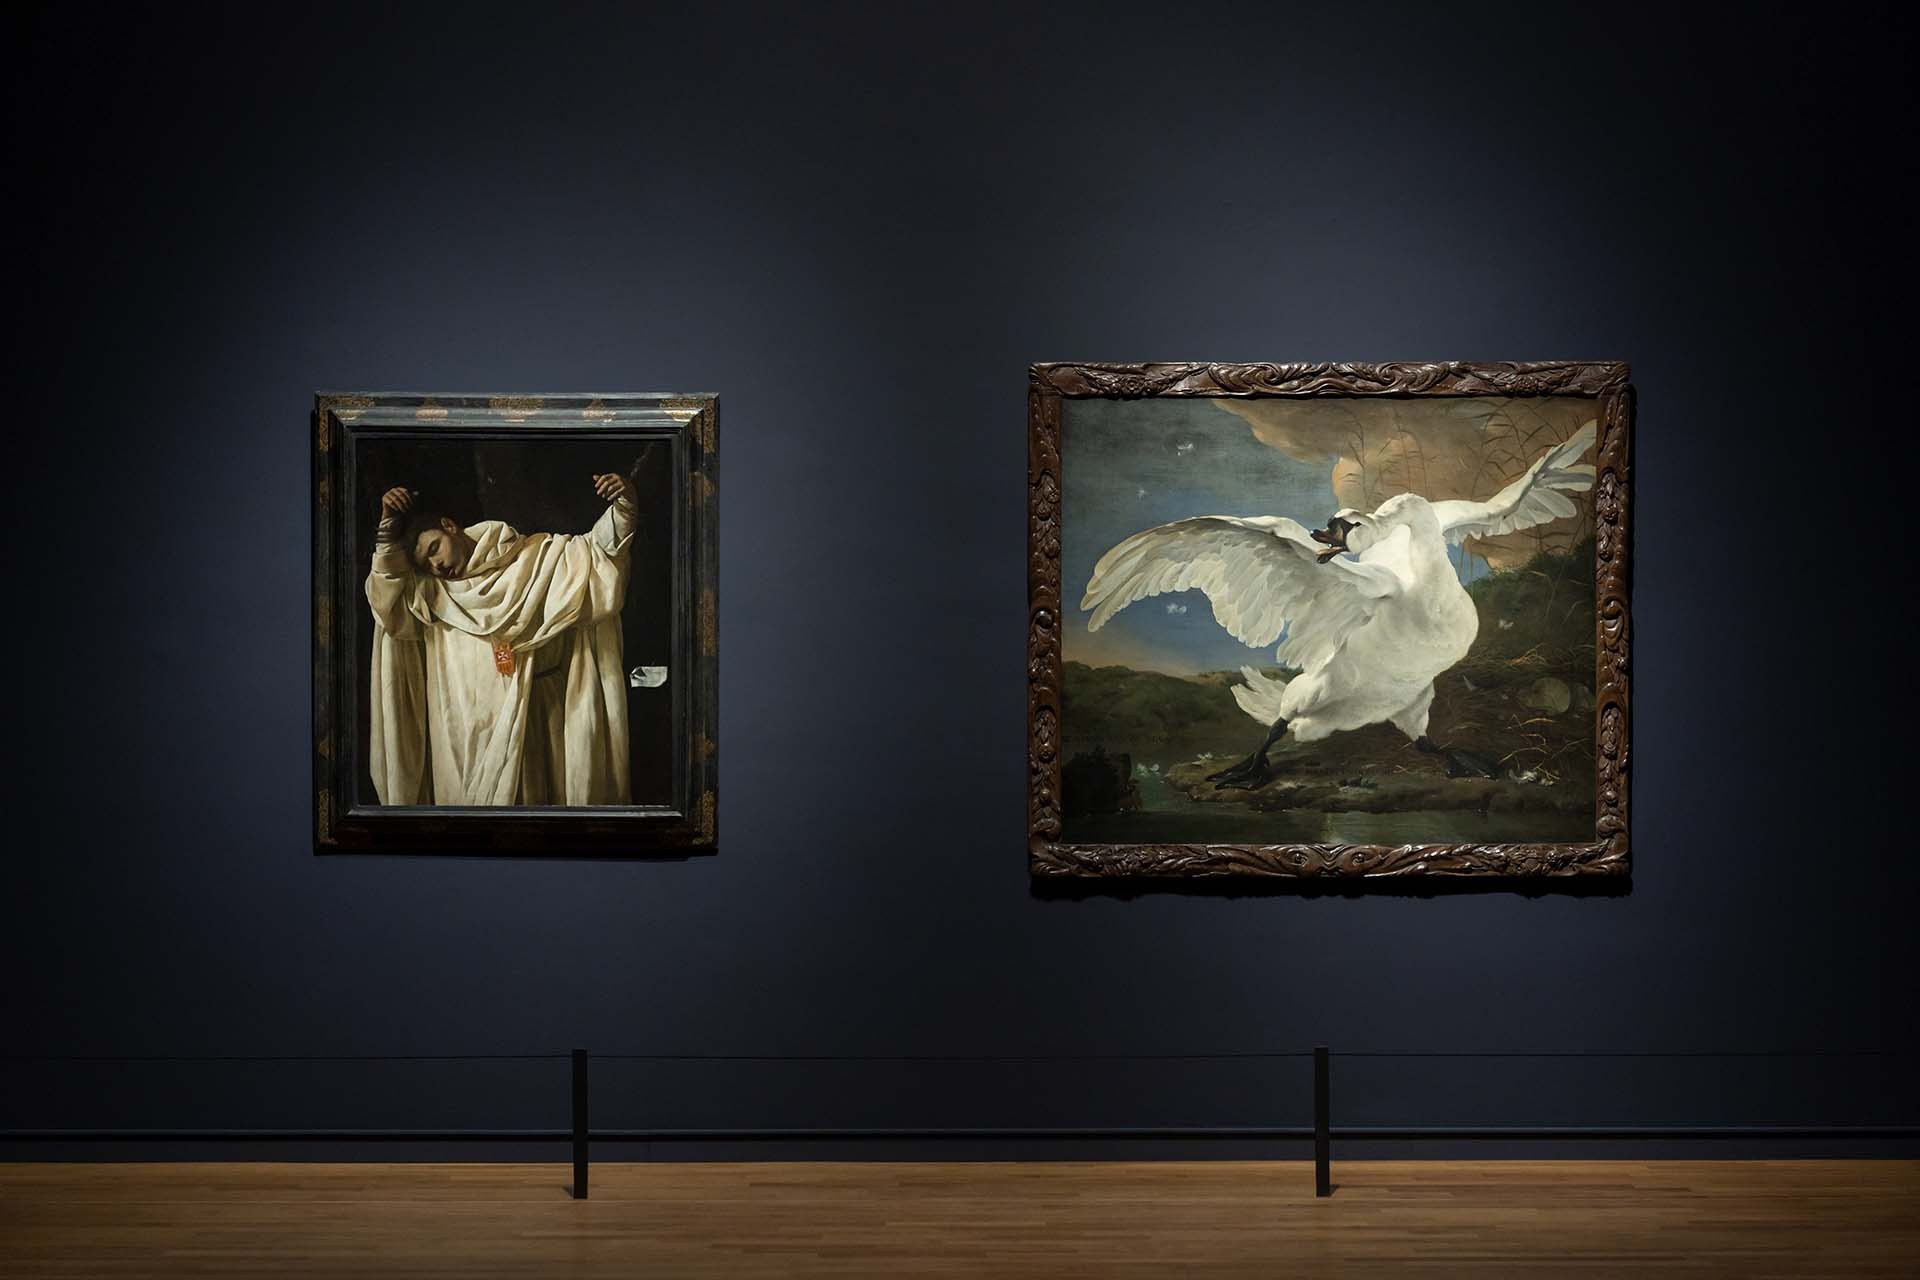 rijksmuseum-rembrandt-velazquez.jpg